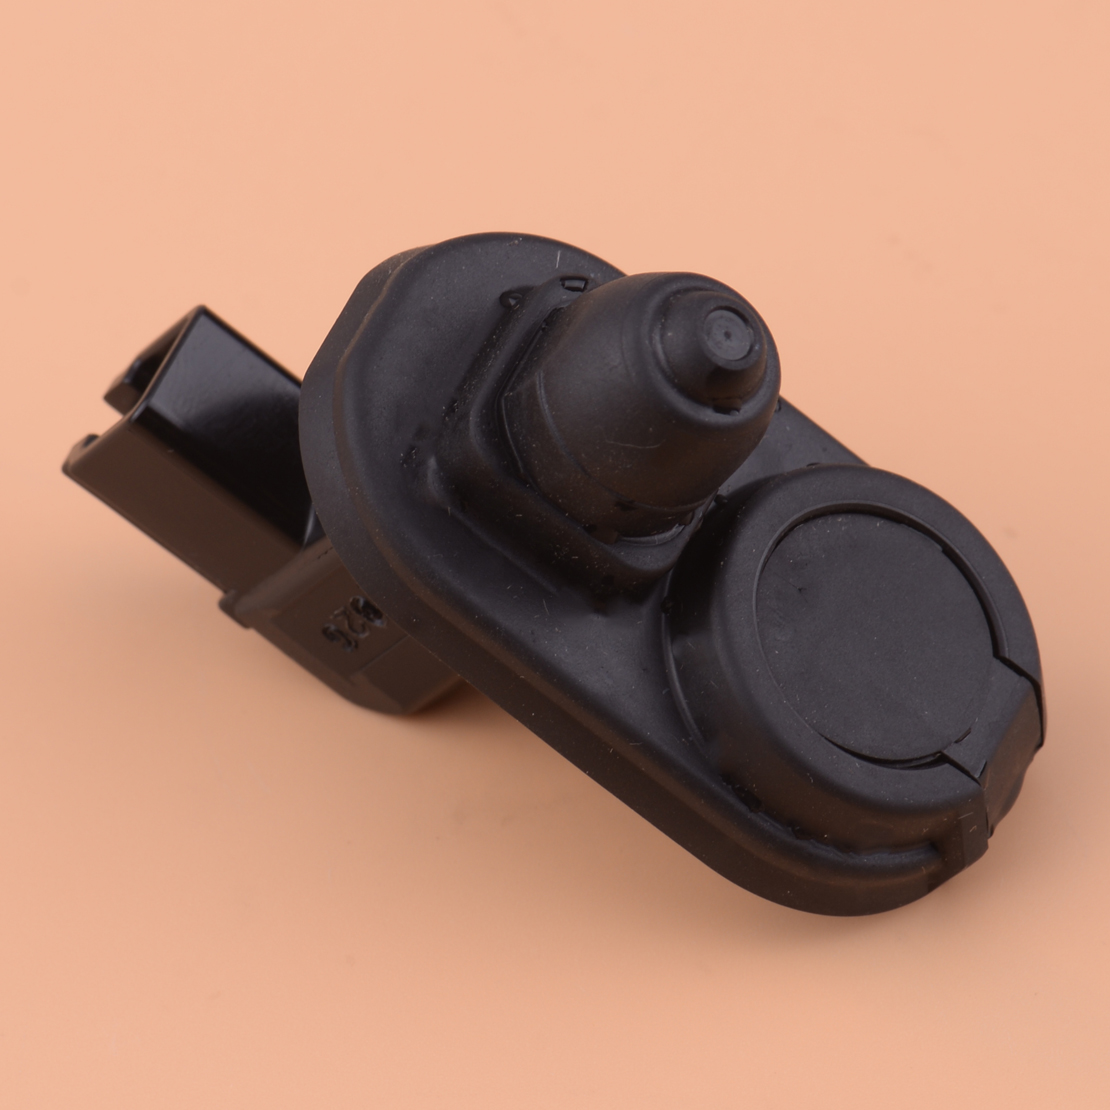 Citall novo carro preto porta jamb luz interruptor da lâmpada apto para honda accord civic CR-V crostour elemento odyssey piloto ridgeline